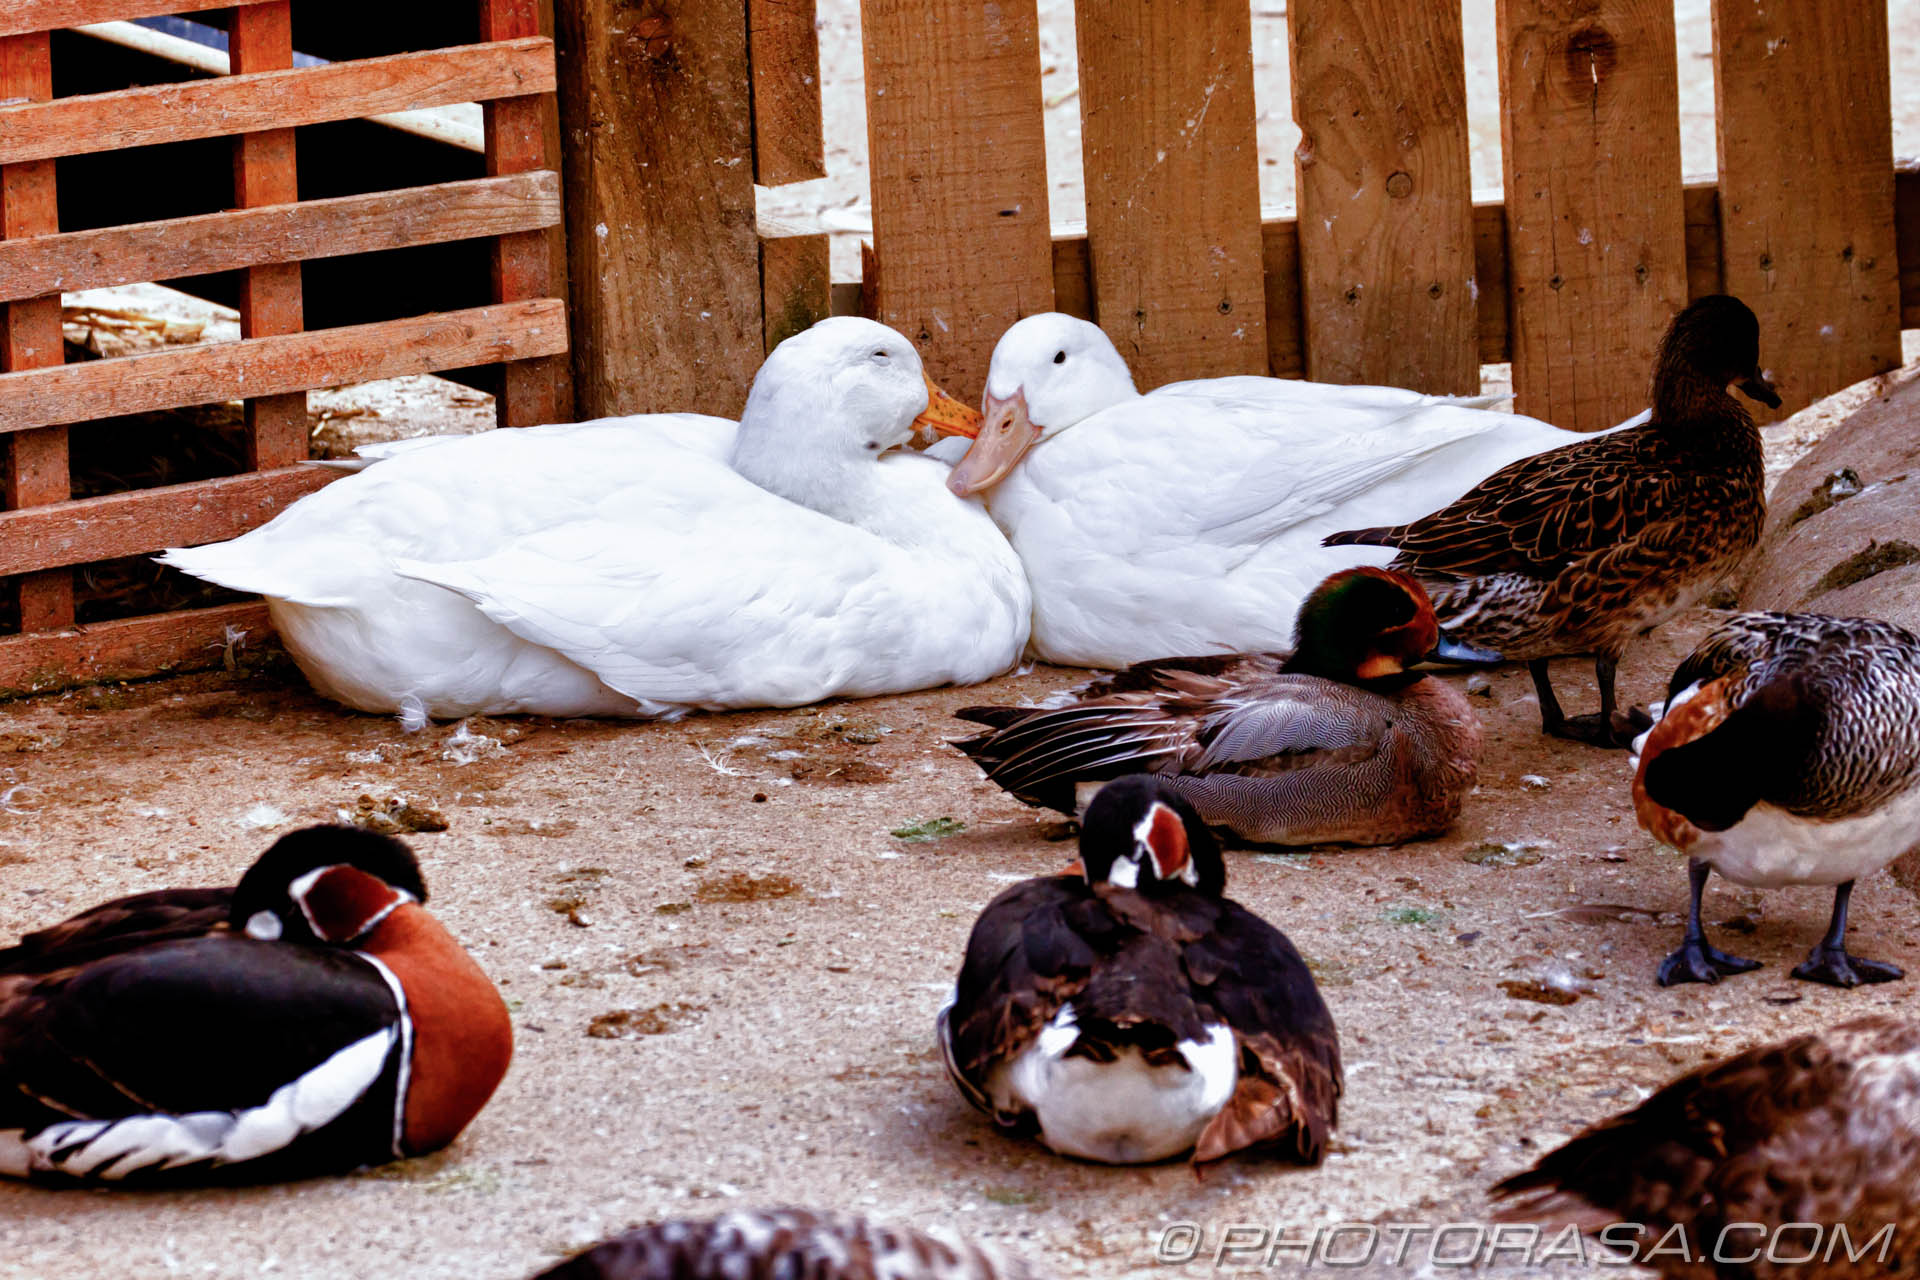 http://photorasa.com/birds-greenworld/cuddling-ducks/